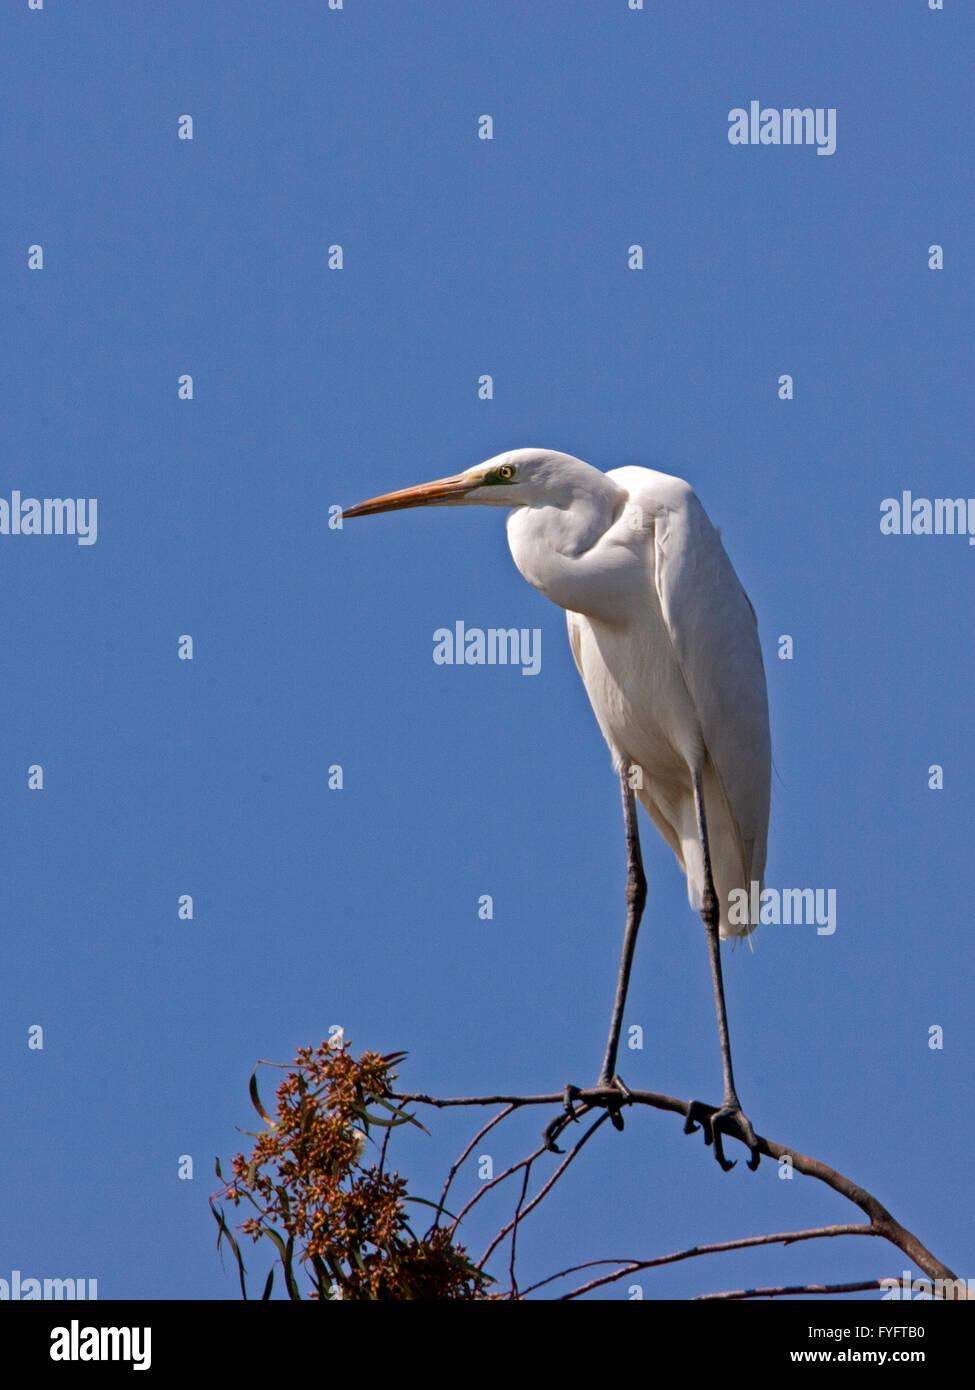 Große Silberreiher (Casmerodius Albus oder Ardea Alba) Hulla Tal, Israel Stockbild